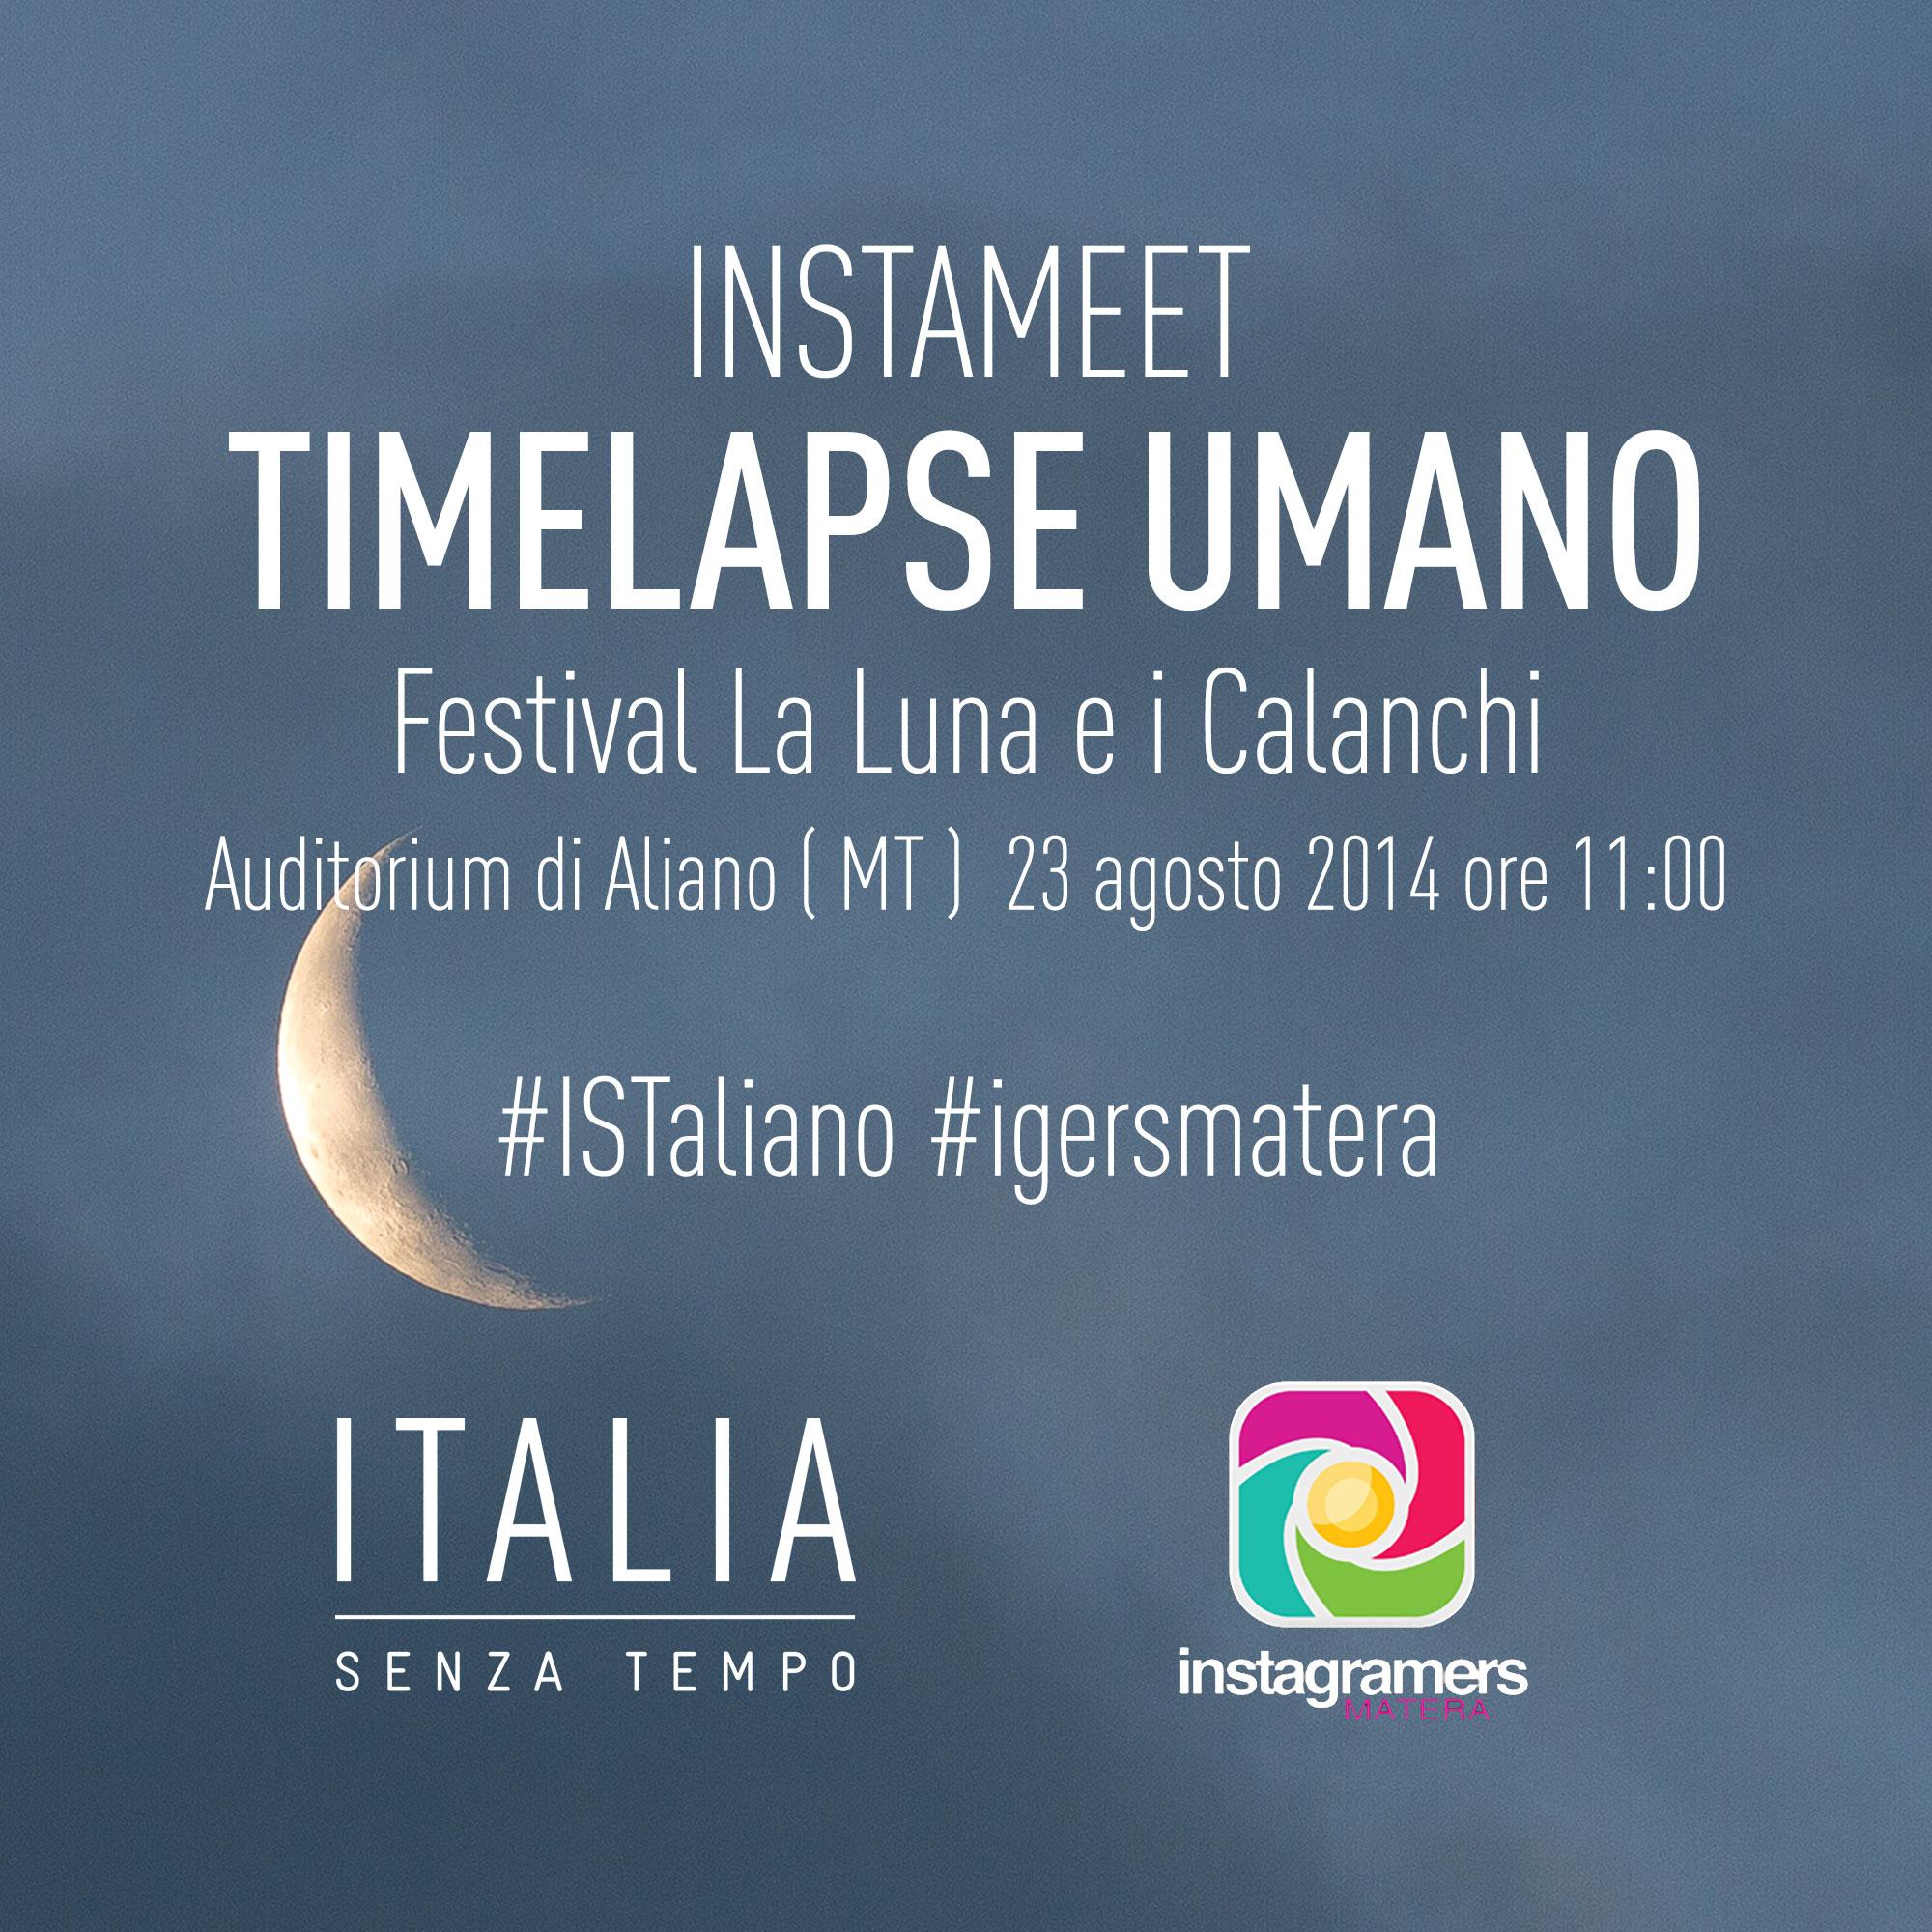 Timelapse Umano ad Aliano con IgersMatera